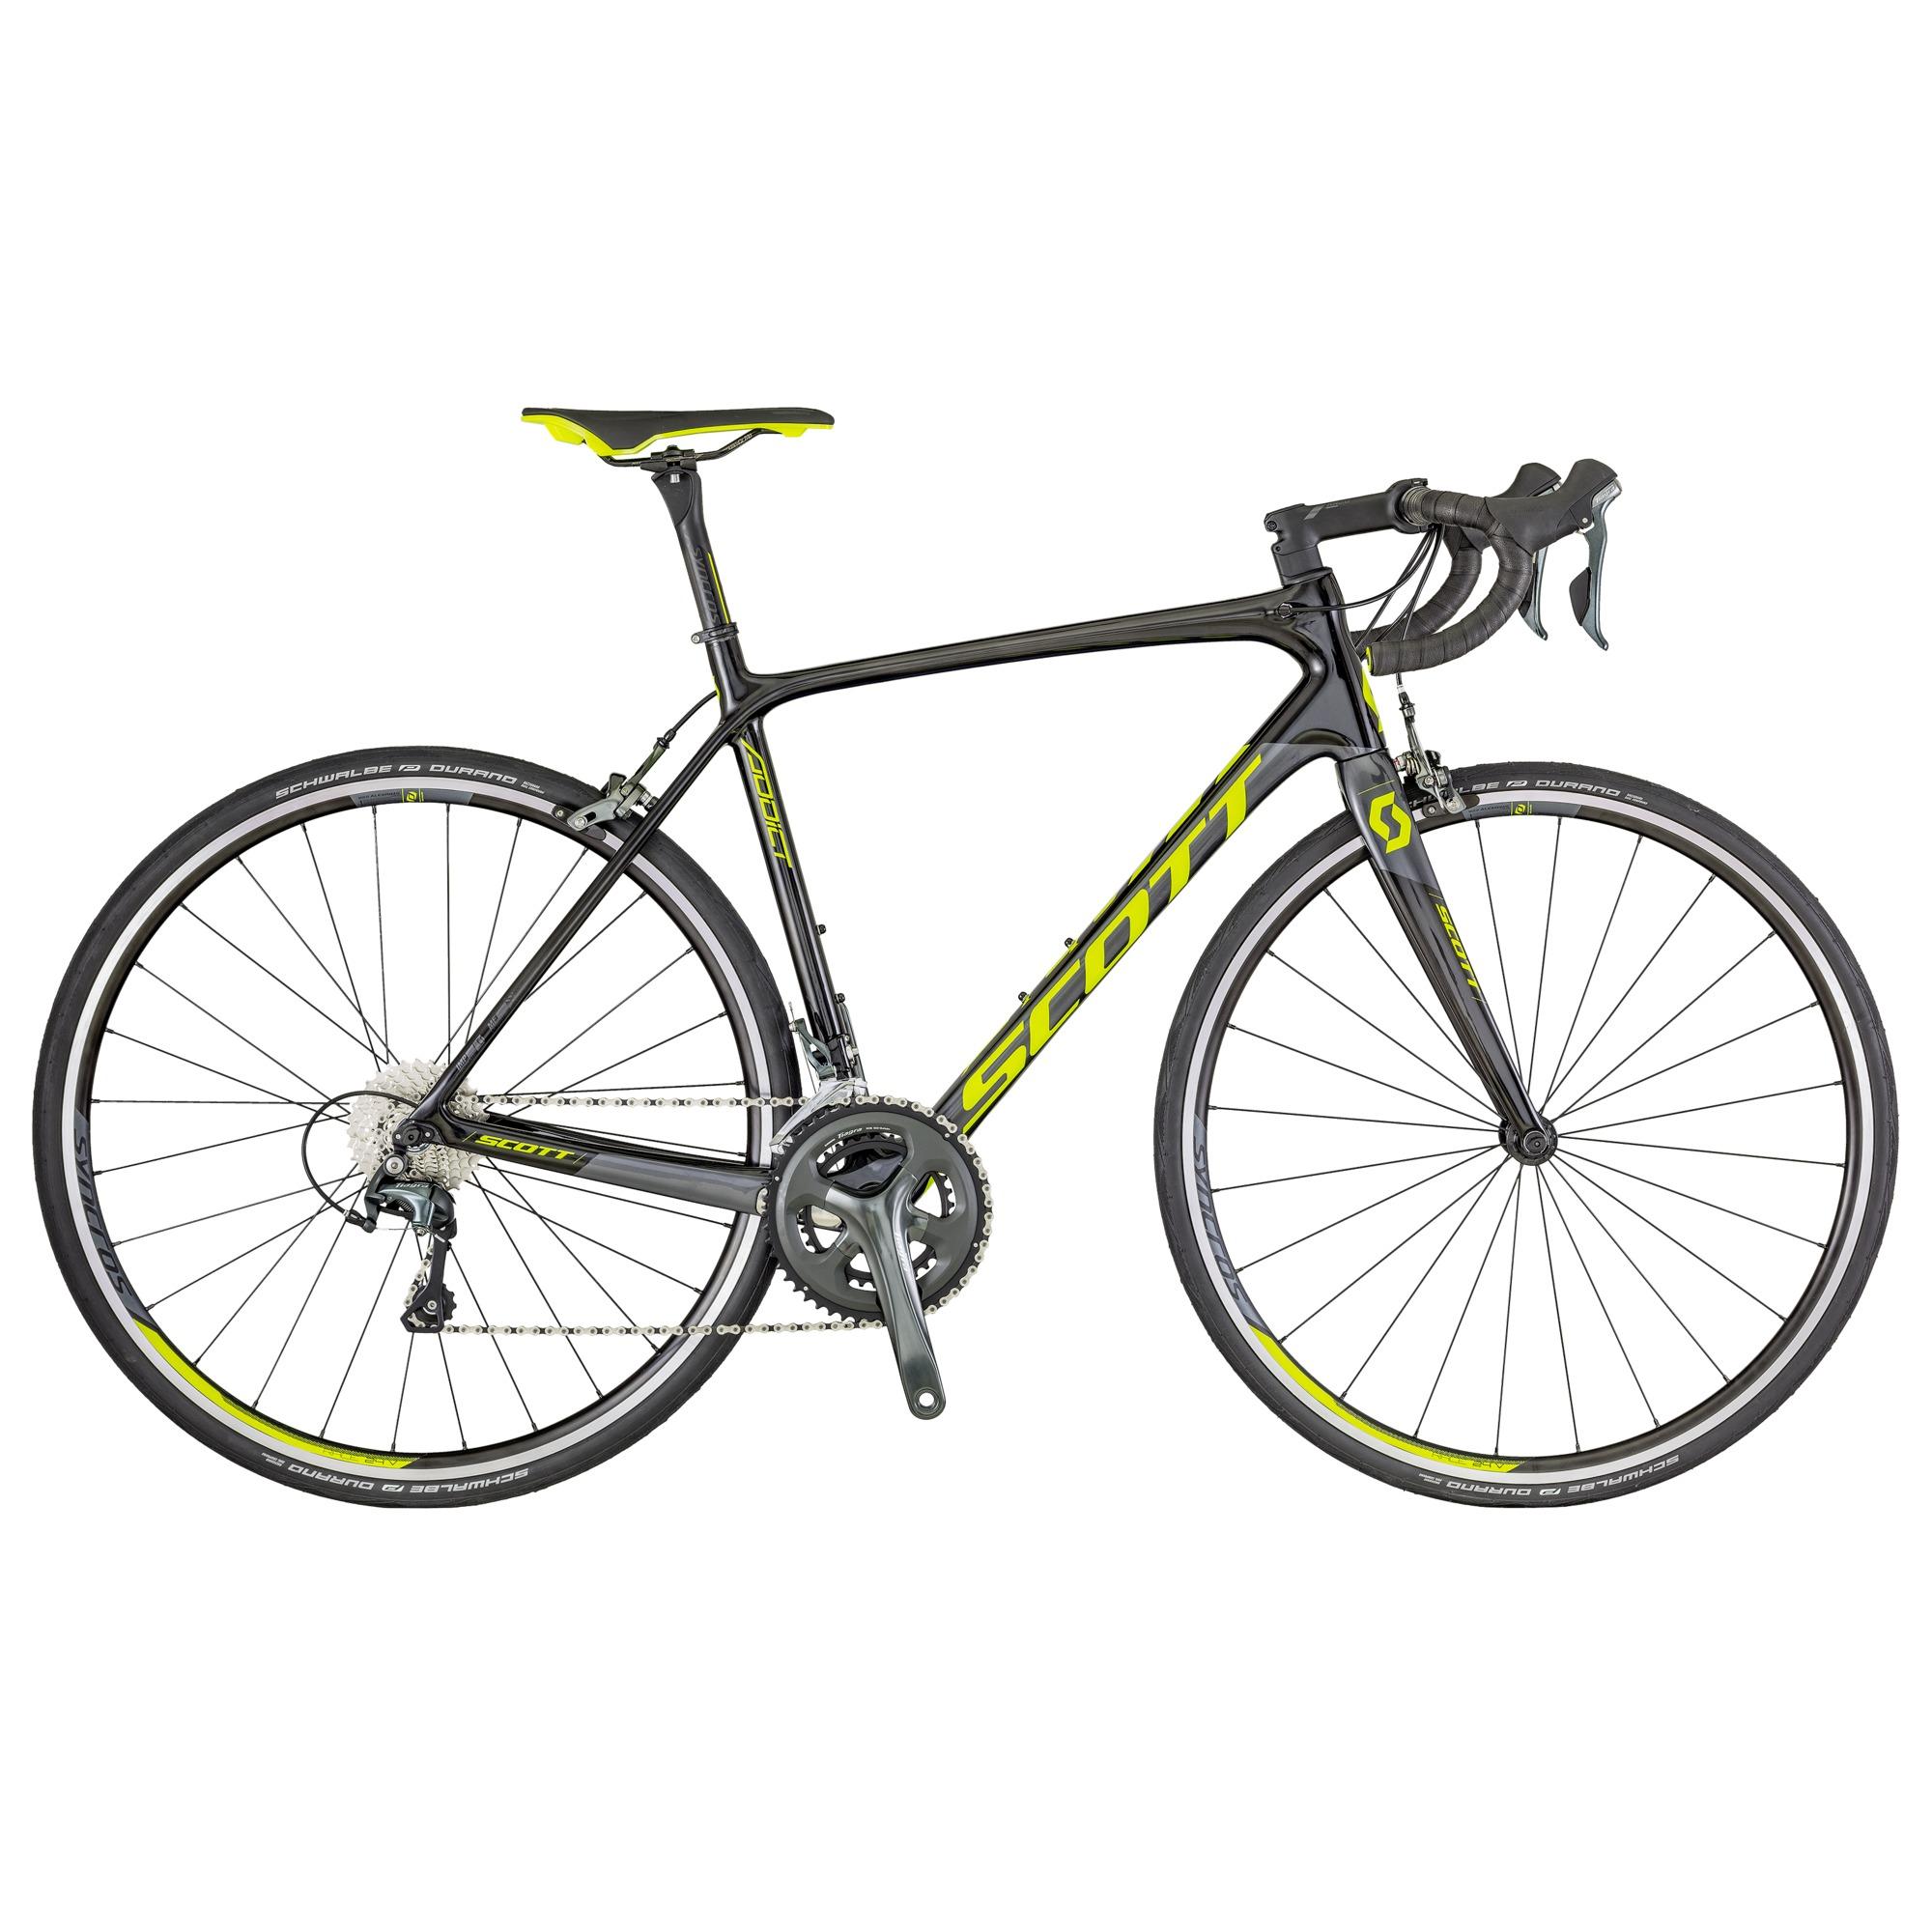 SCOTT Addict 30 Bike 2XL61 - Zweirad Homann